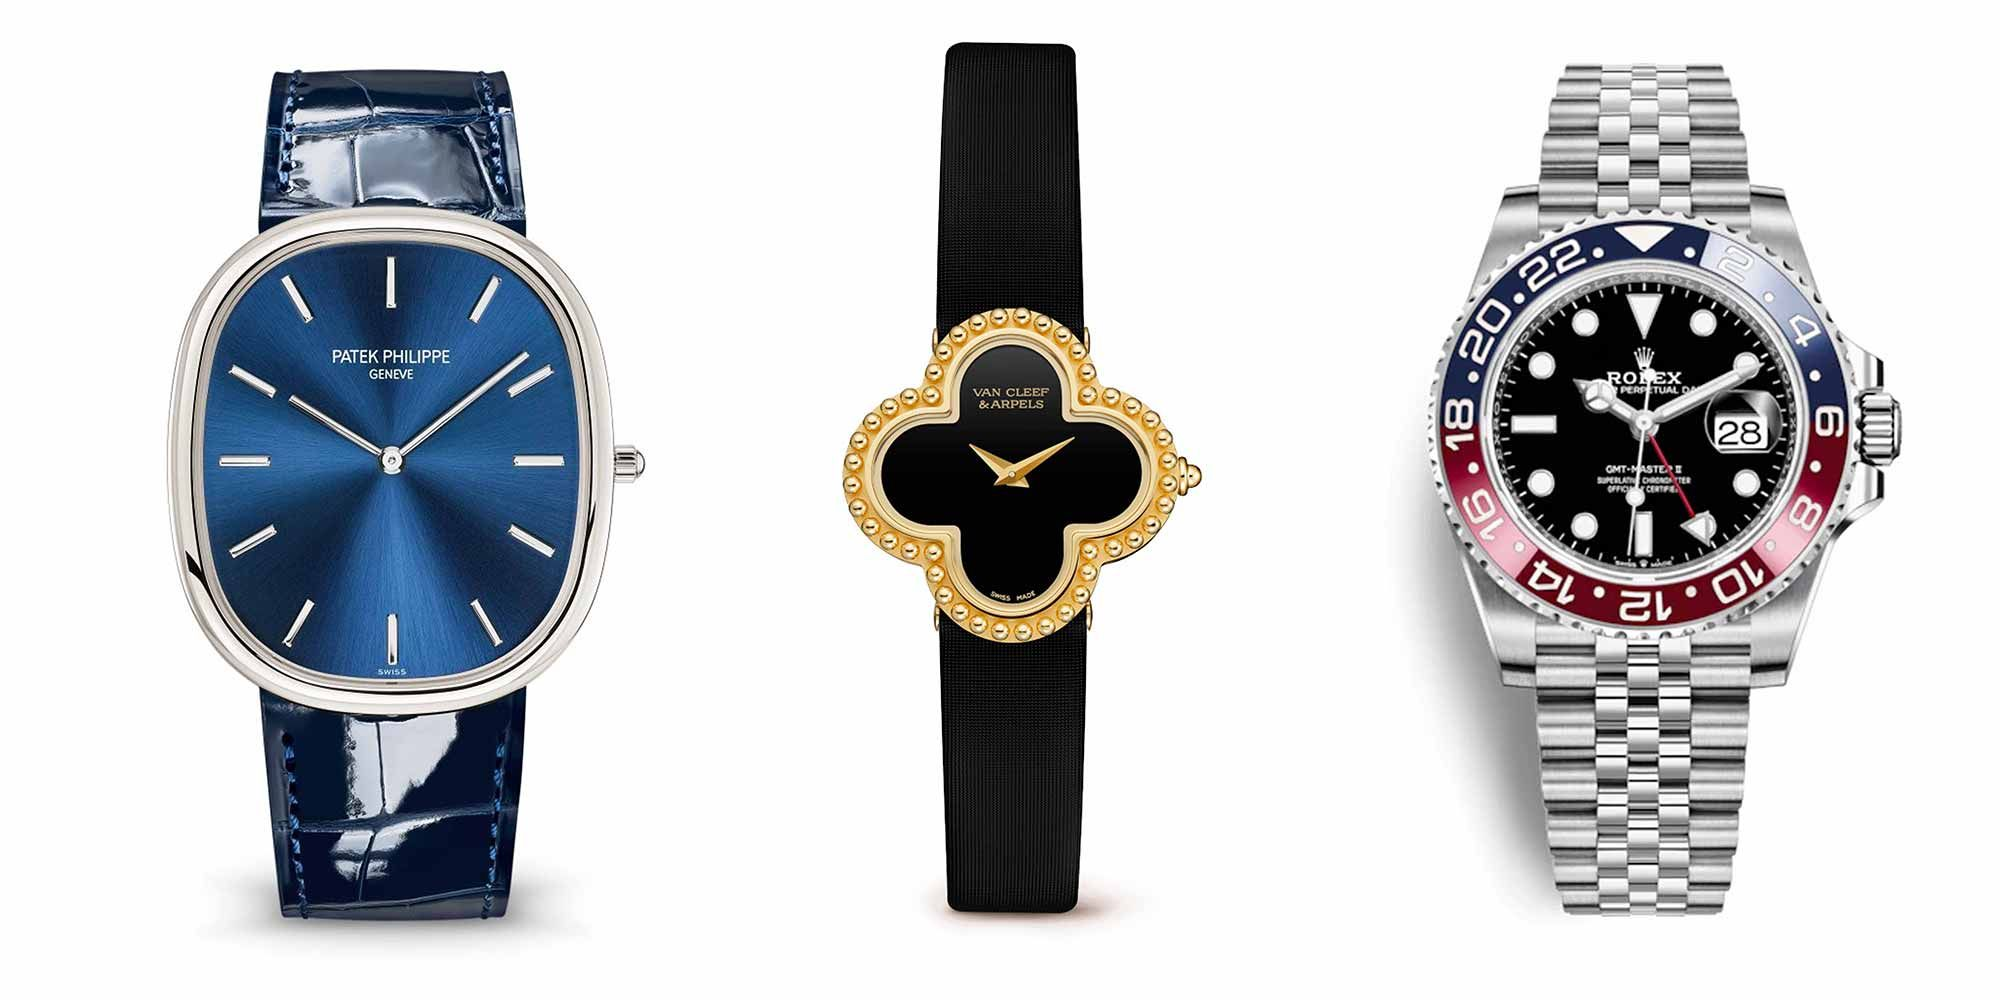 0fd90947f77 15 Best Swiss Watch Brands in 2018 - Luxury Swiss Made Watches for Men